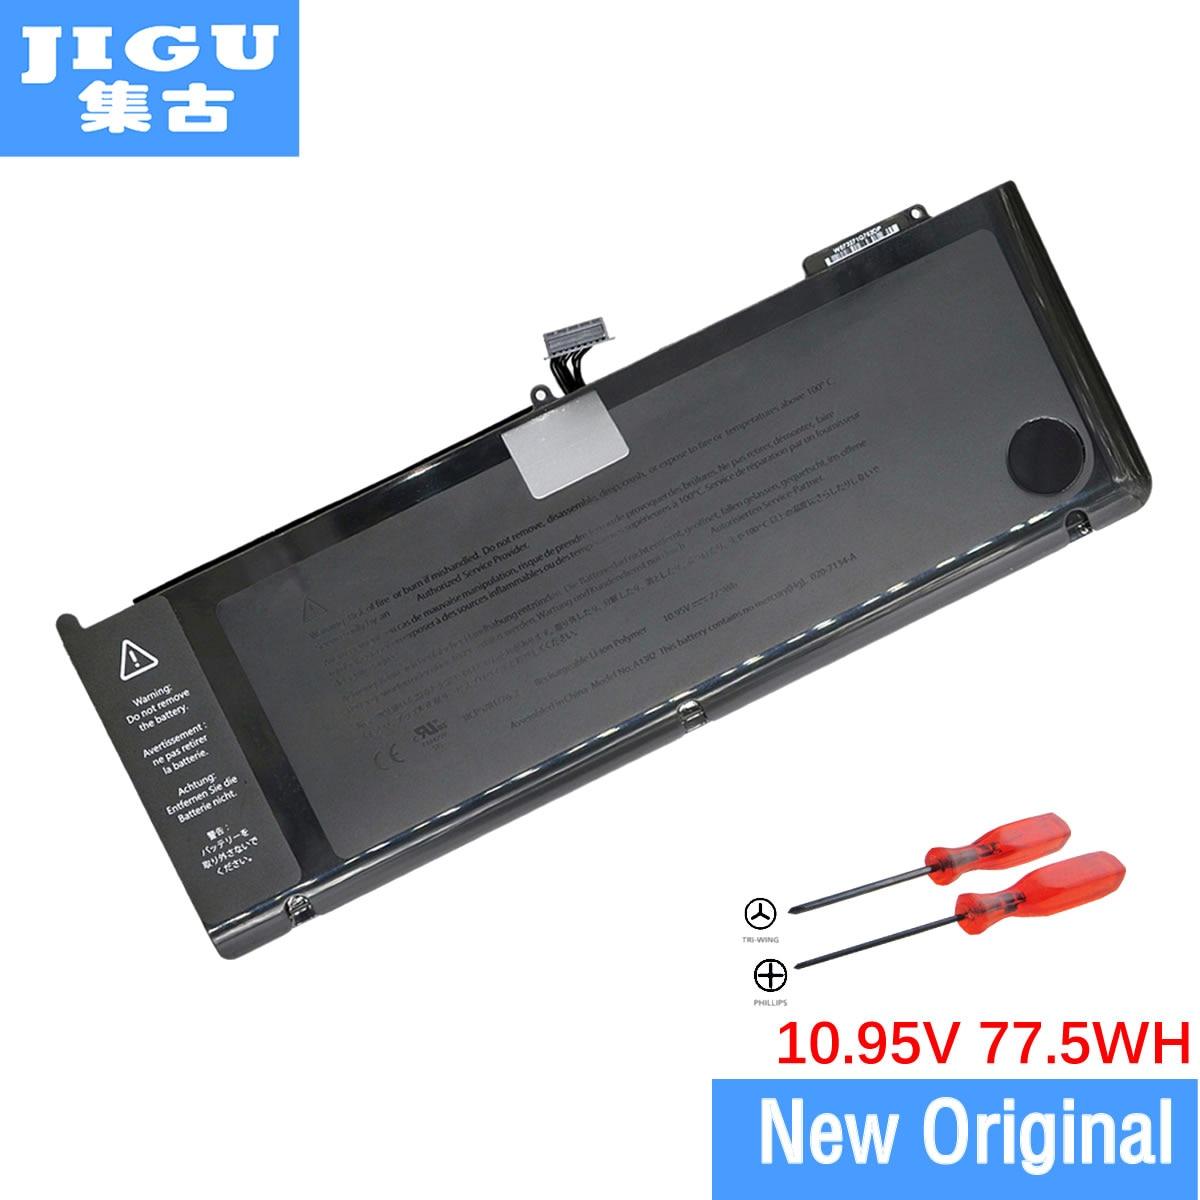 "MacBook Pro 15 ""A1286 MC721 MC723 üçün Apple üçün JIGU A1382 Orijinal noutbuk batareyası."